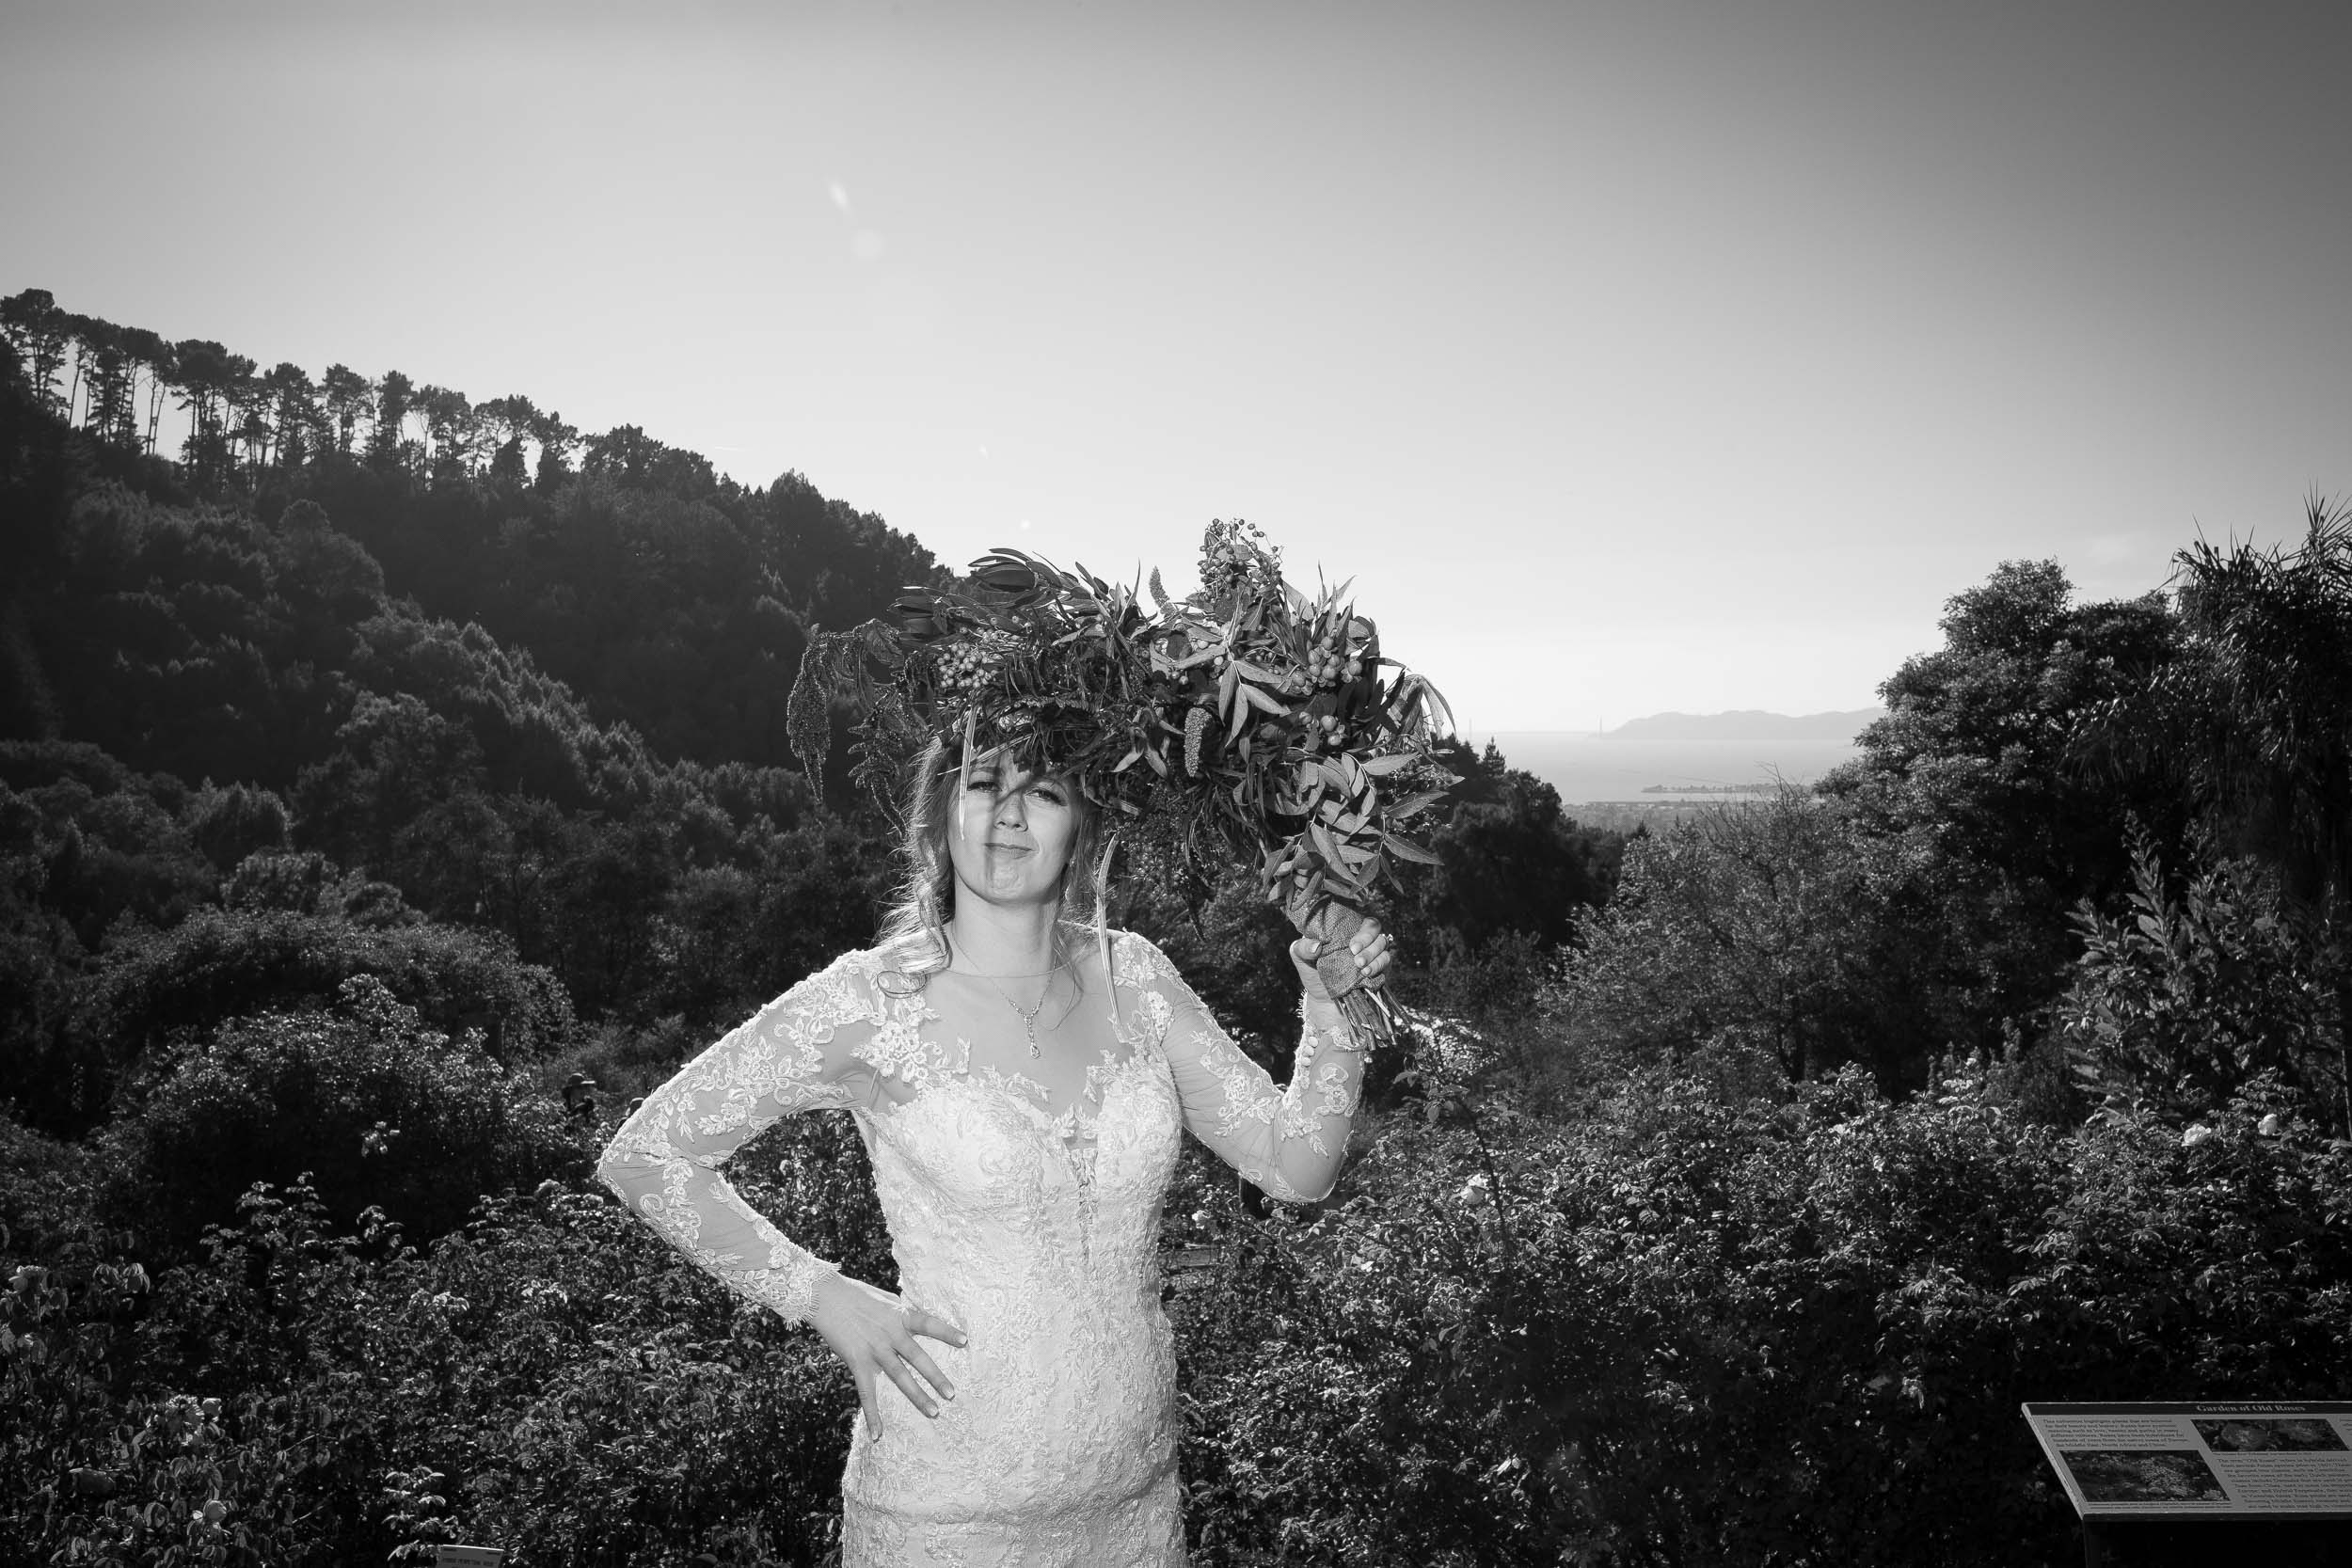 Berkeley Botanical Garden Wedding Ceremony in the Redwood Grove Ceremony and SF Bay Wedding Cruise Reception-57.jpg